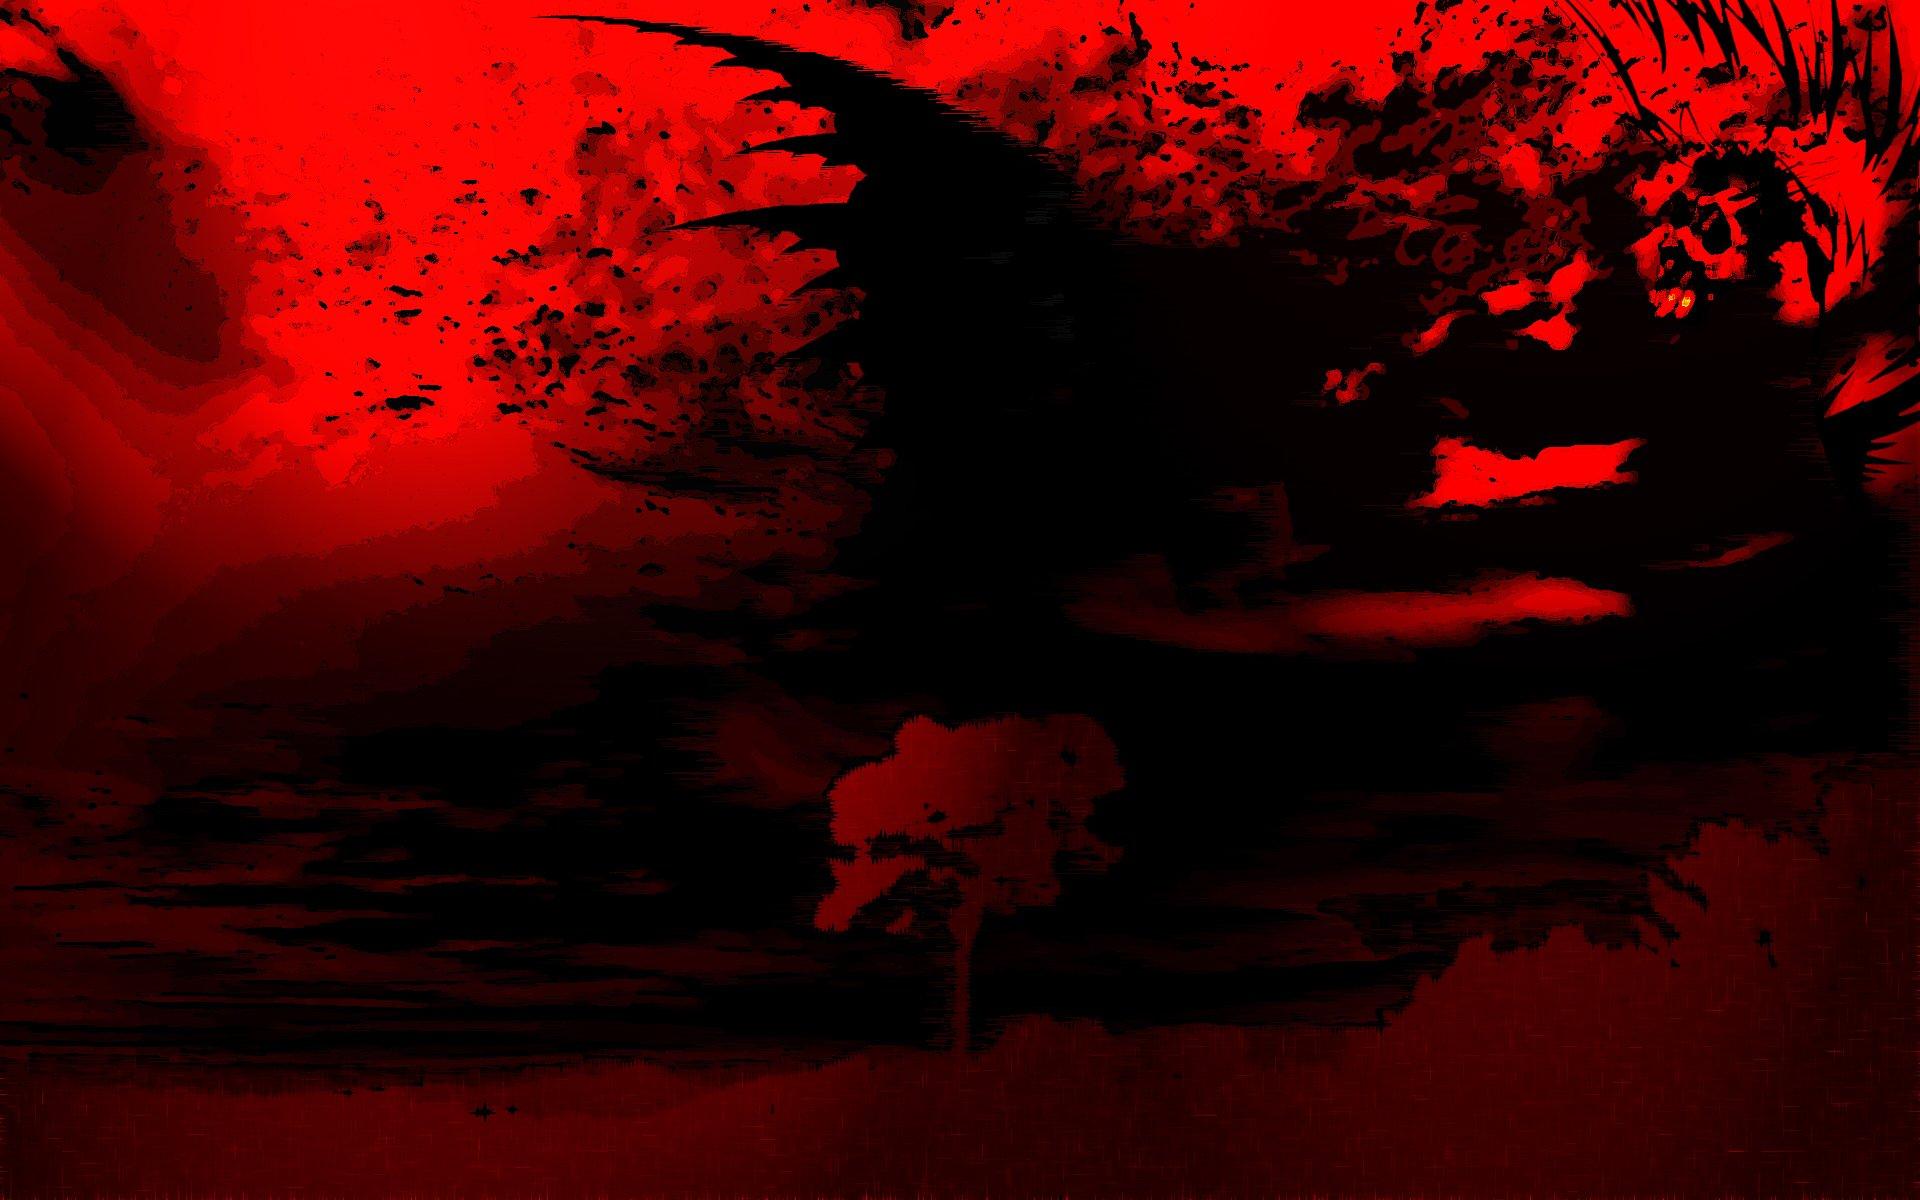 71] Blood Red Wallpaper on WallpaperSafari 1920x1200